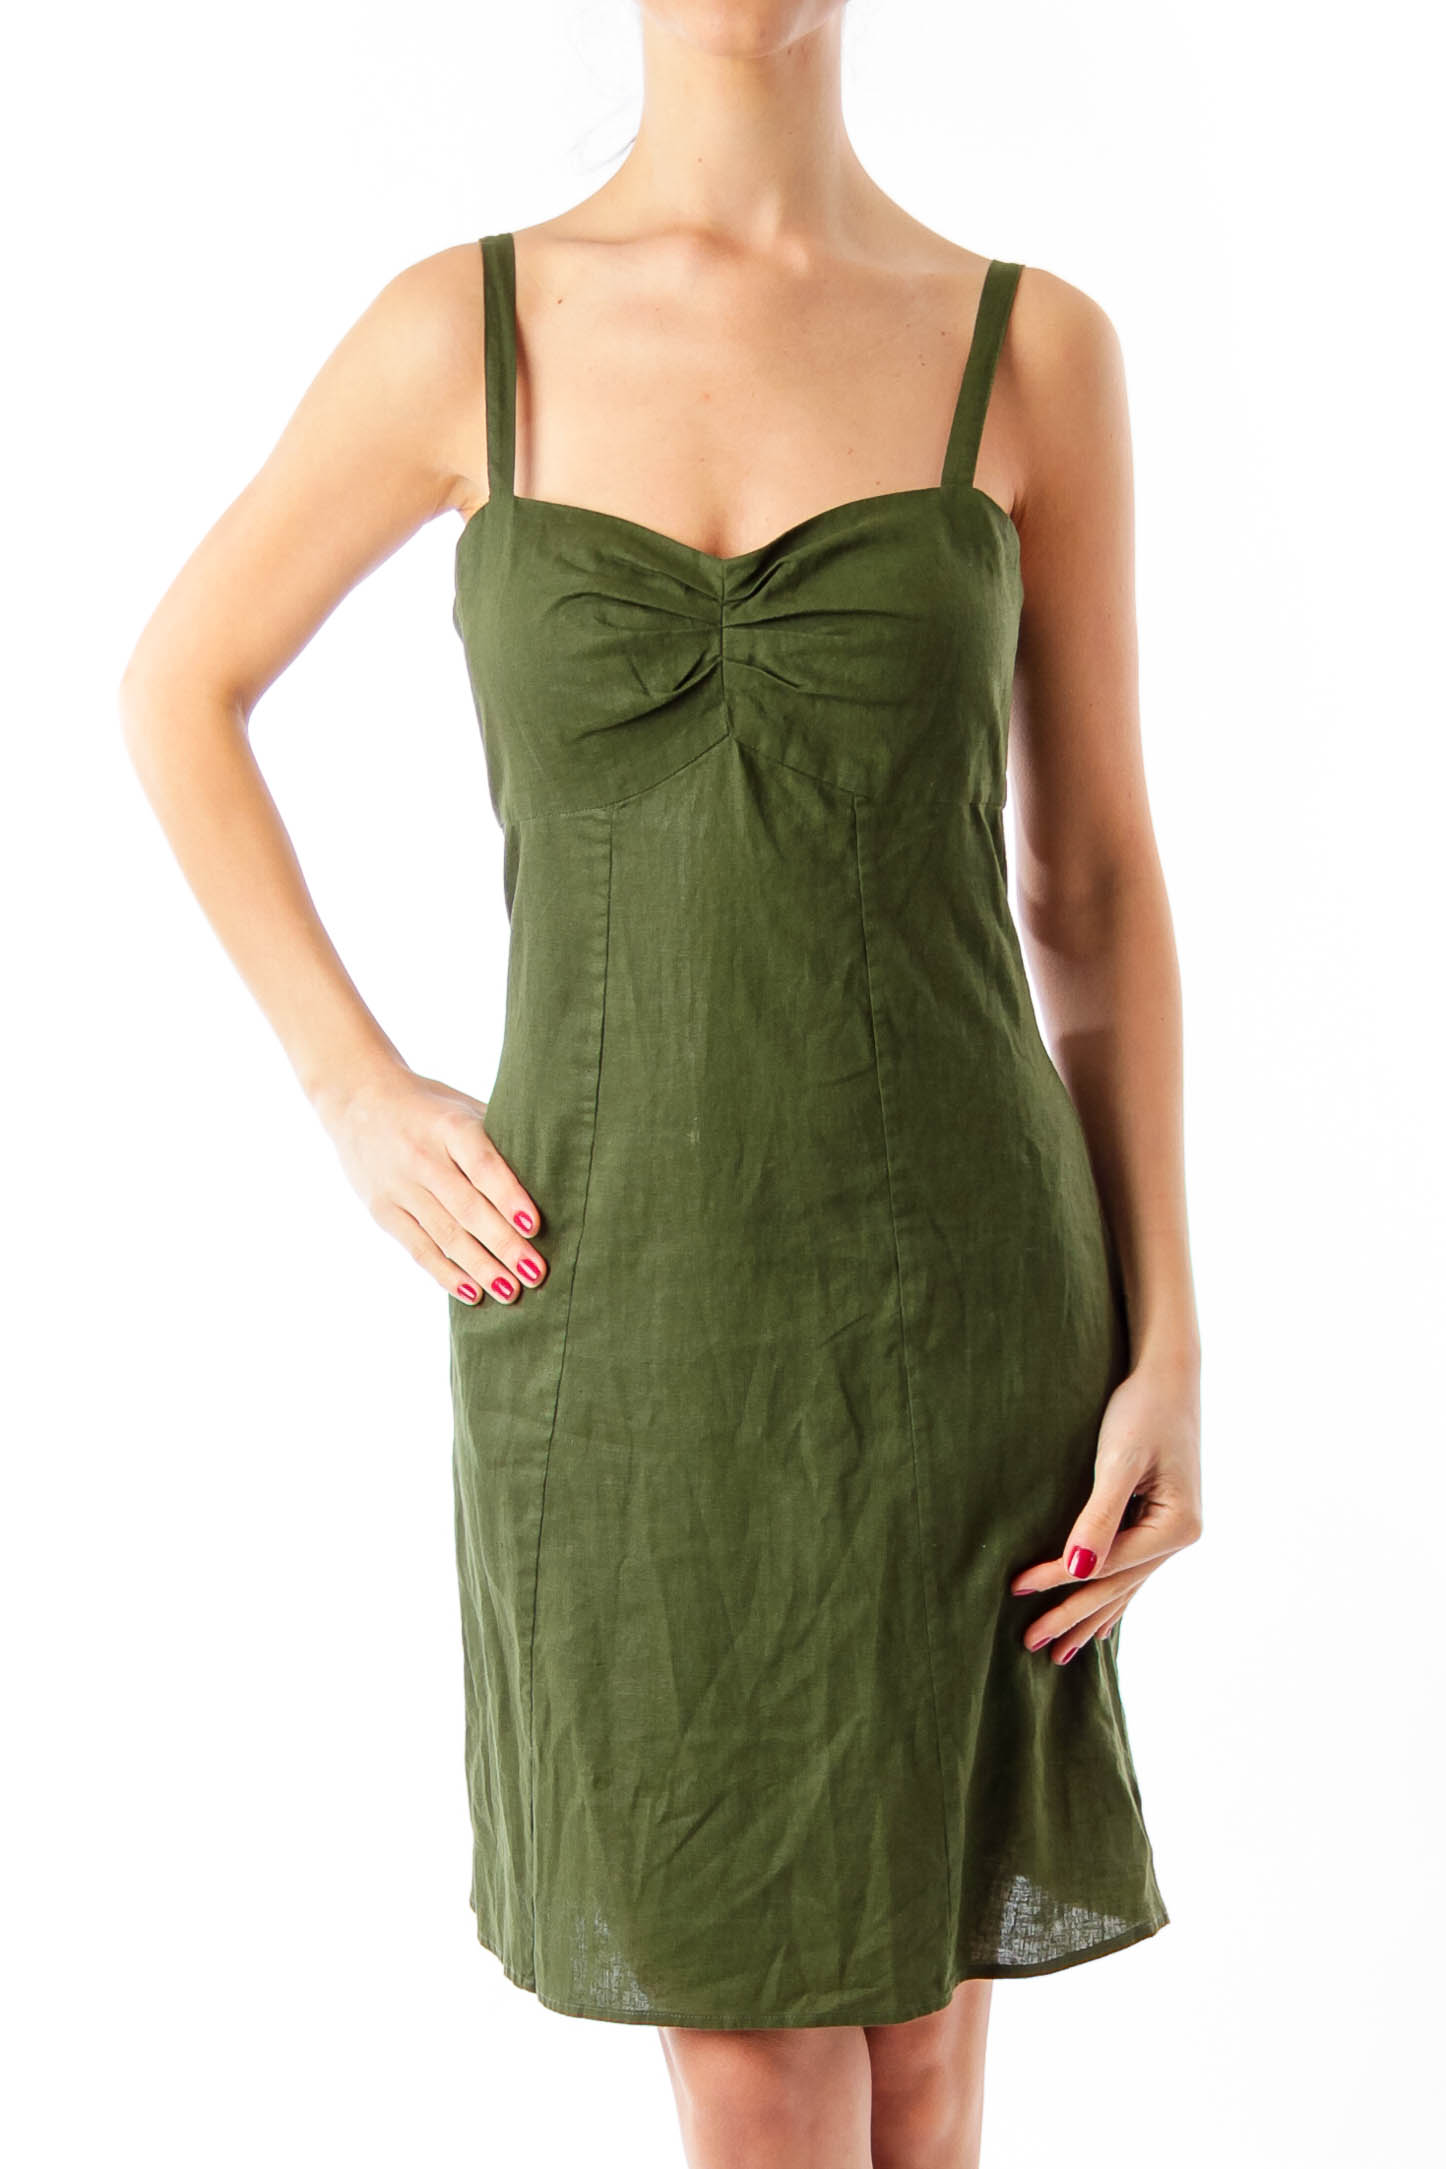 Army Green Slip Dress